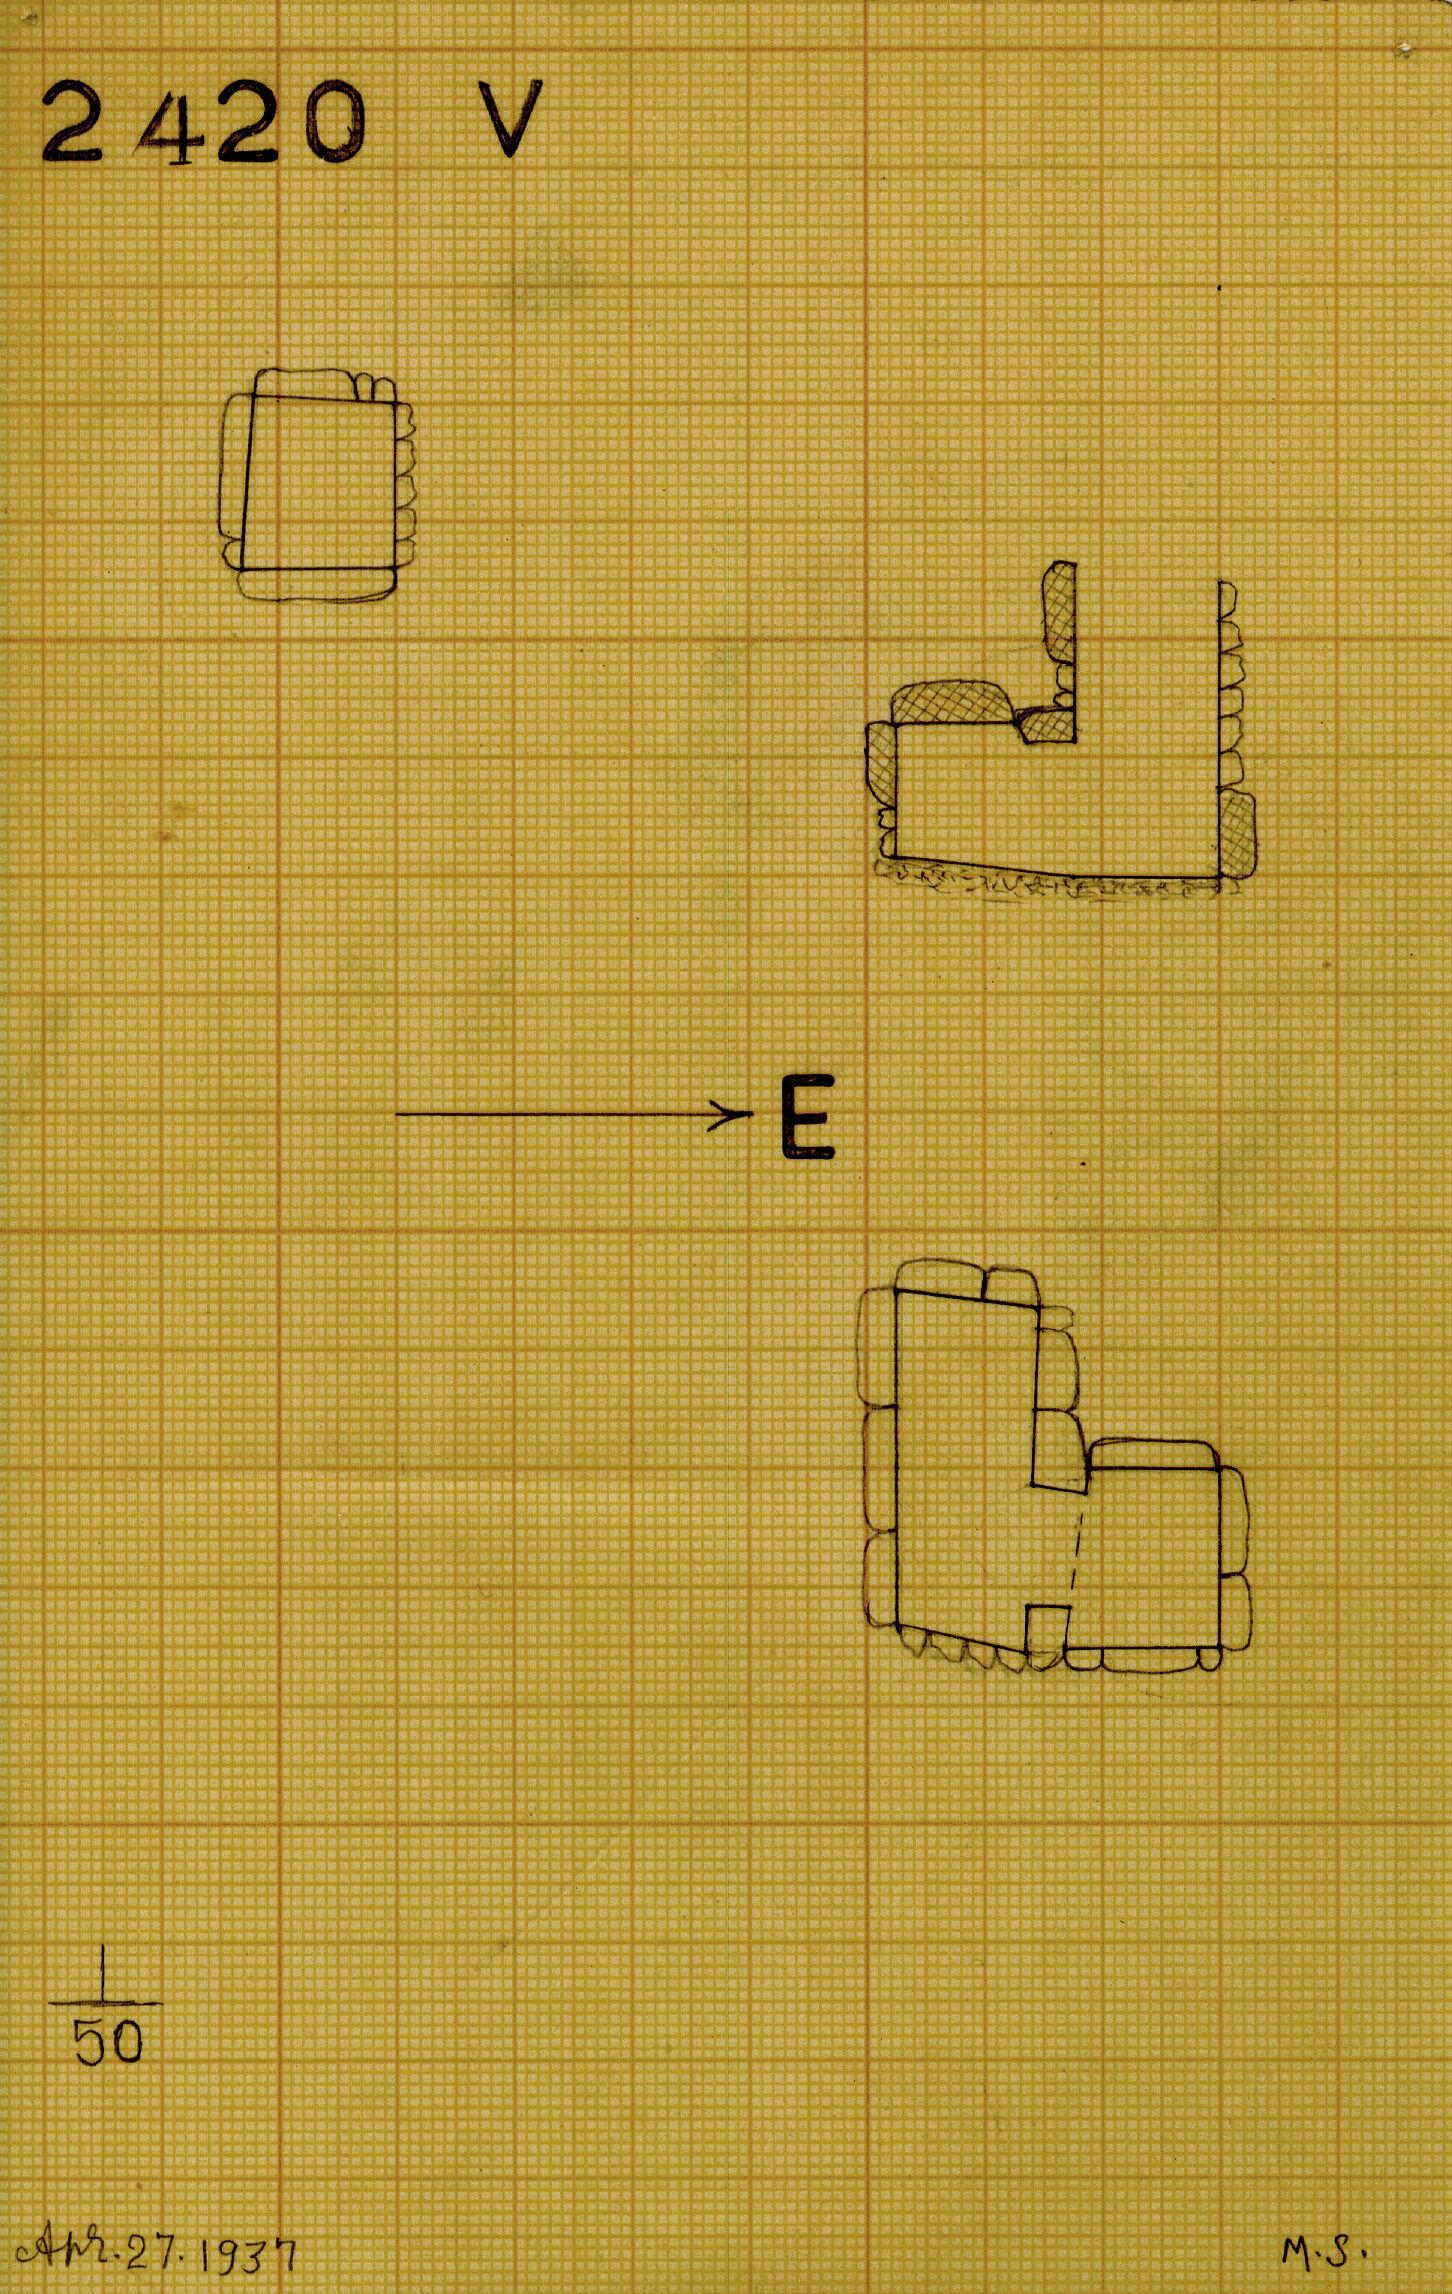 Maps and plans: G 2420, Shaft V